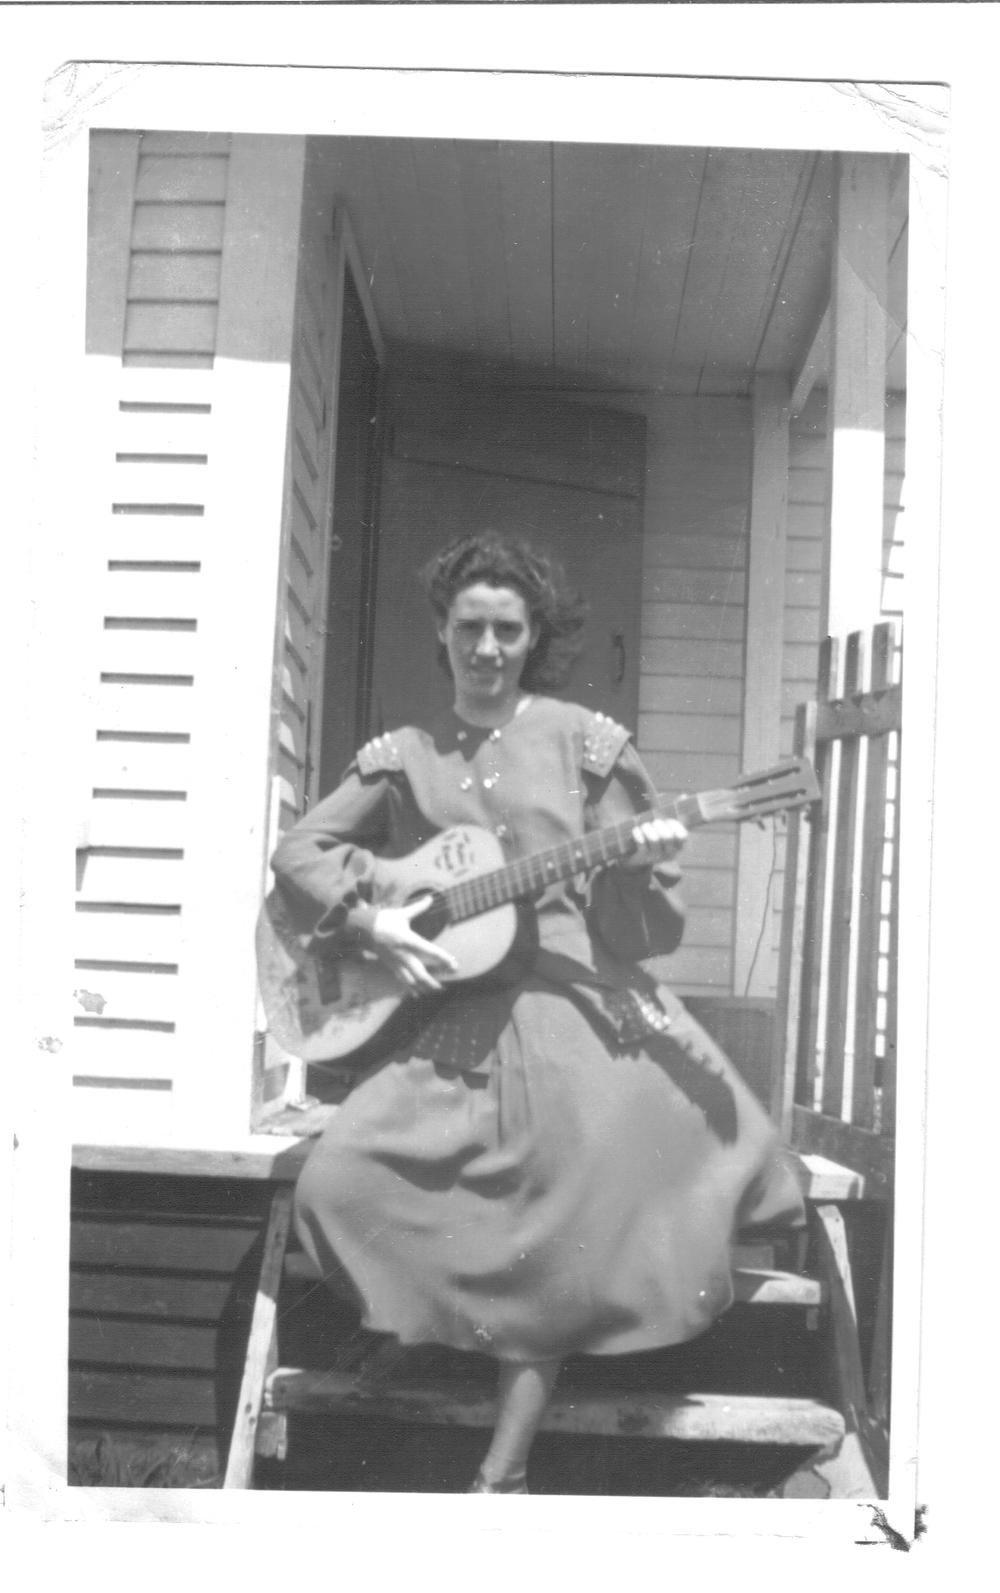 Newfoundland - Zilda Sulley in St. Anthony 1.jpg